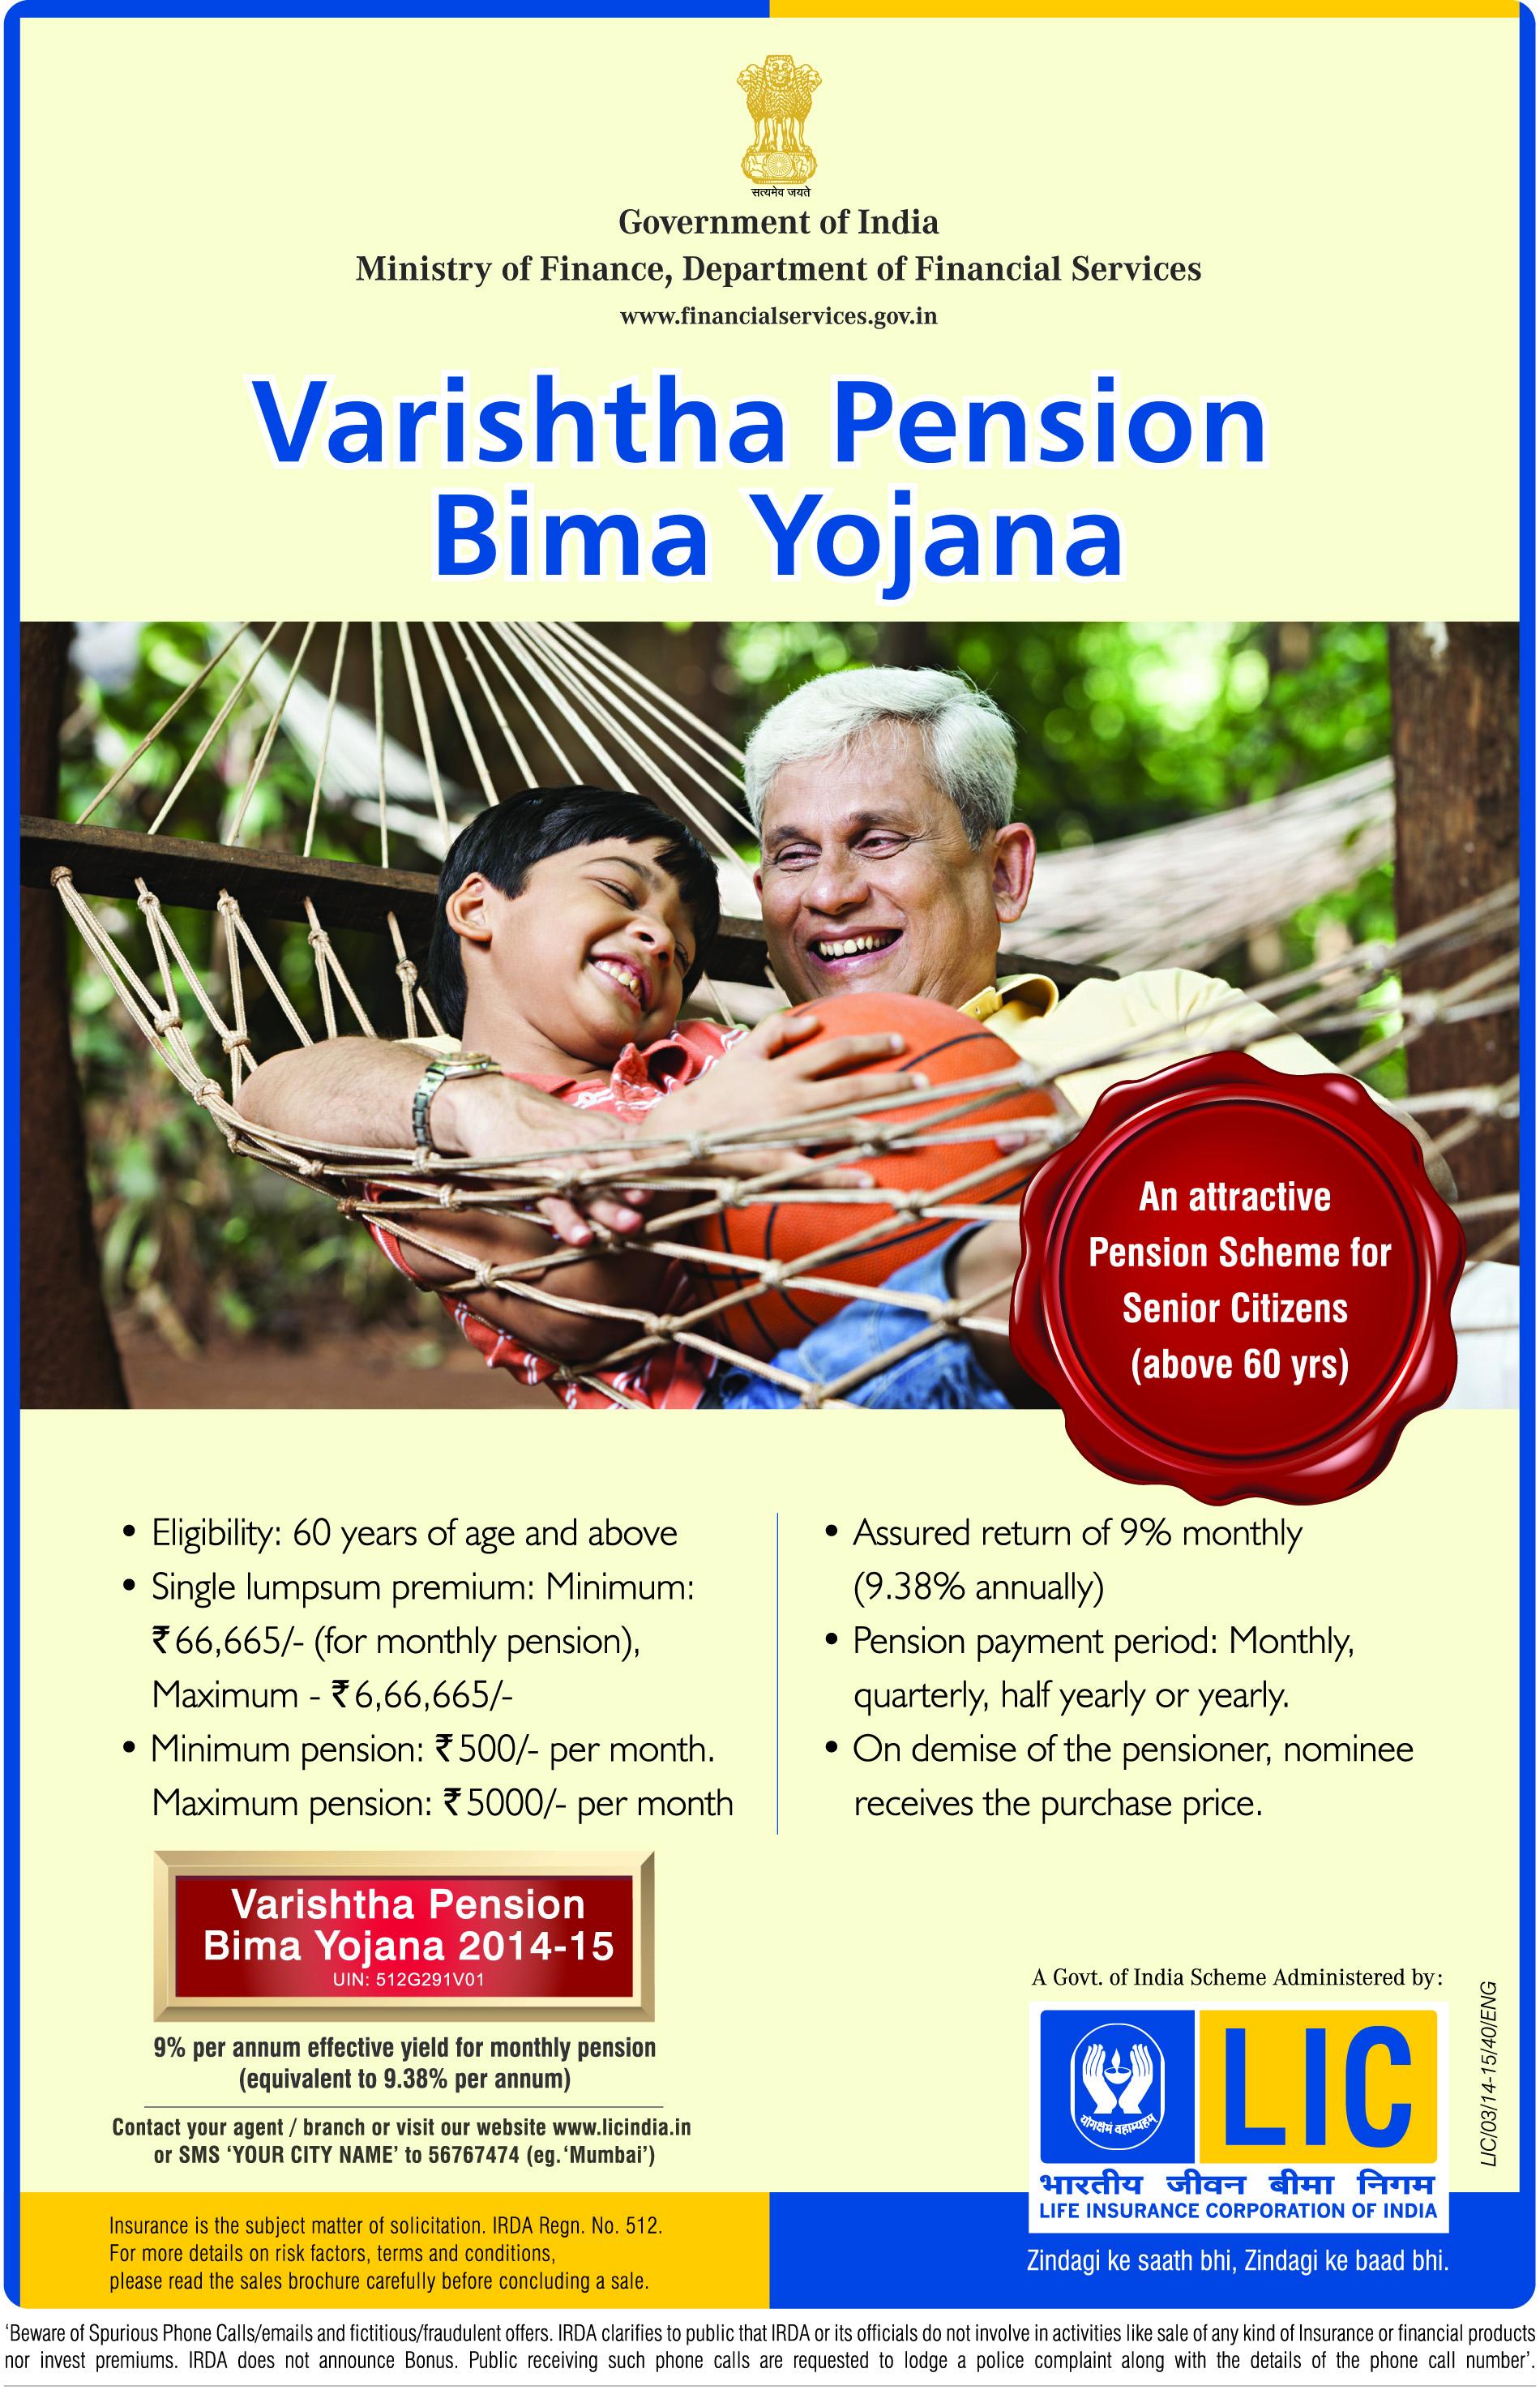 LIC_Varishtha Pension Bima Yojana